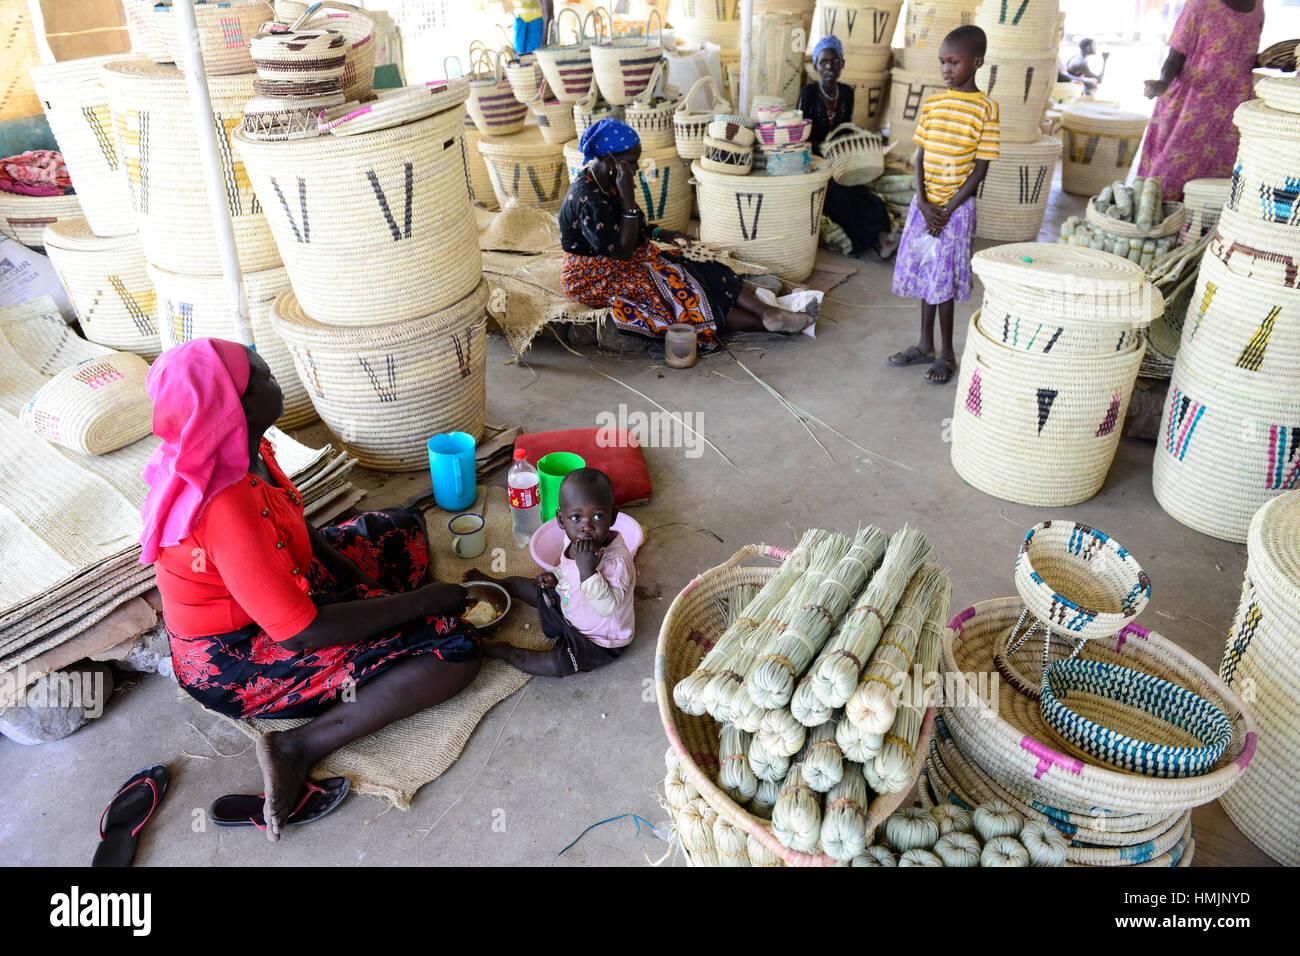 Kenia Turkana, Lodwar, Frauen machen Körbe zum Verkauf an einen Handwerkermarkt / KENIA Turkana, Lodwar, Frauen Stockbild